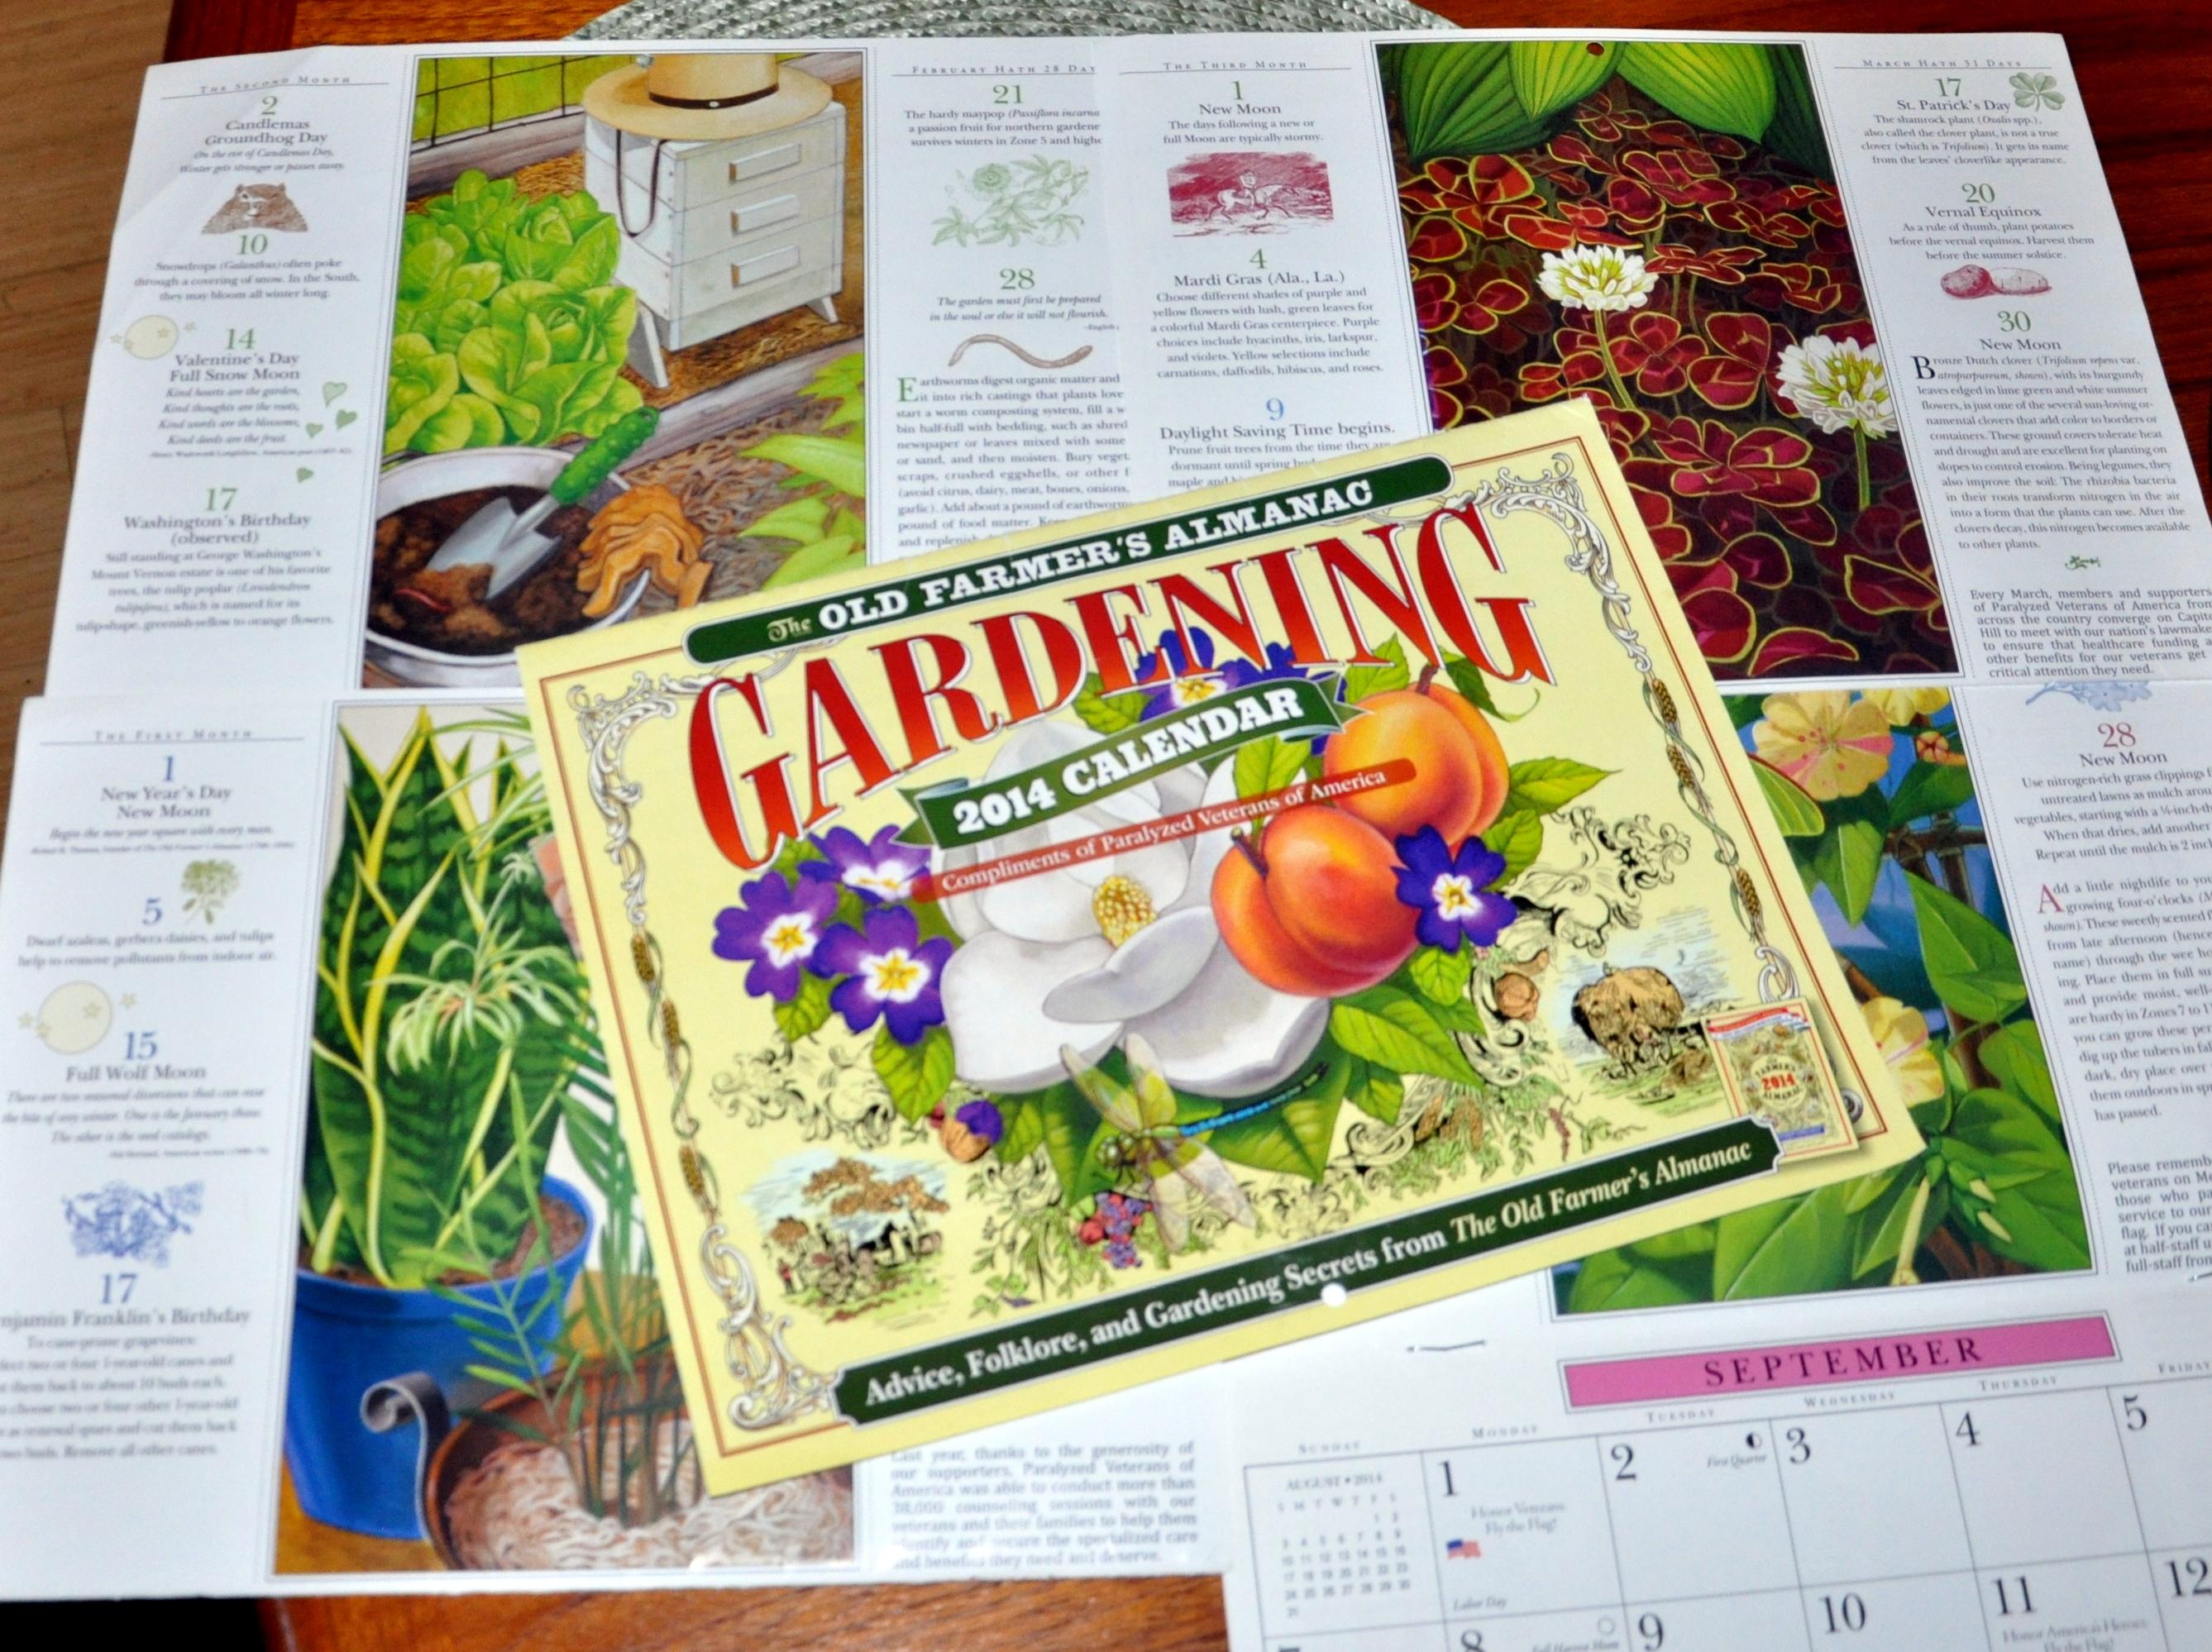 Born to organize gardening nirvana - Farmers almanac gardening calendar ...